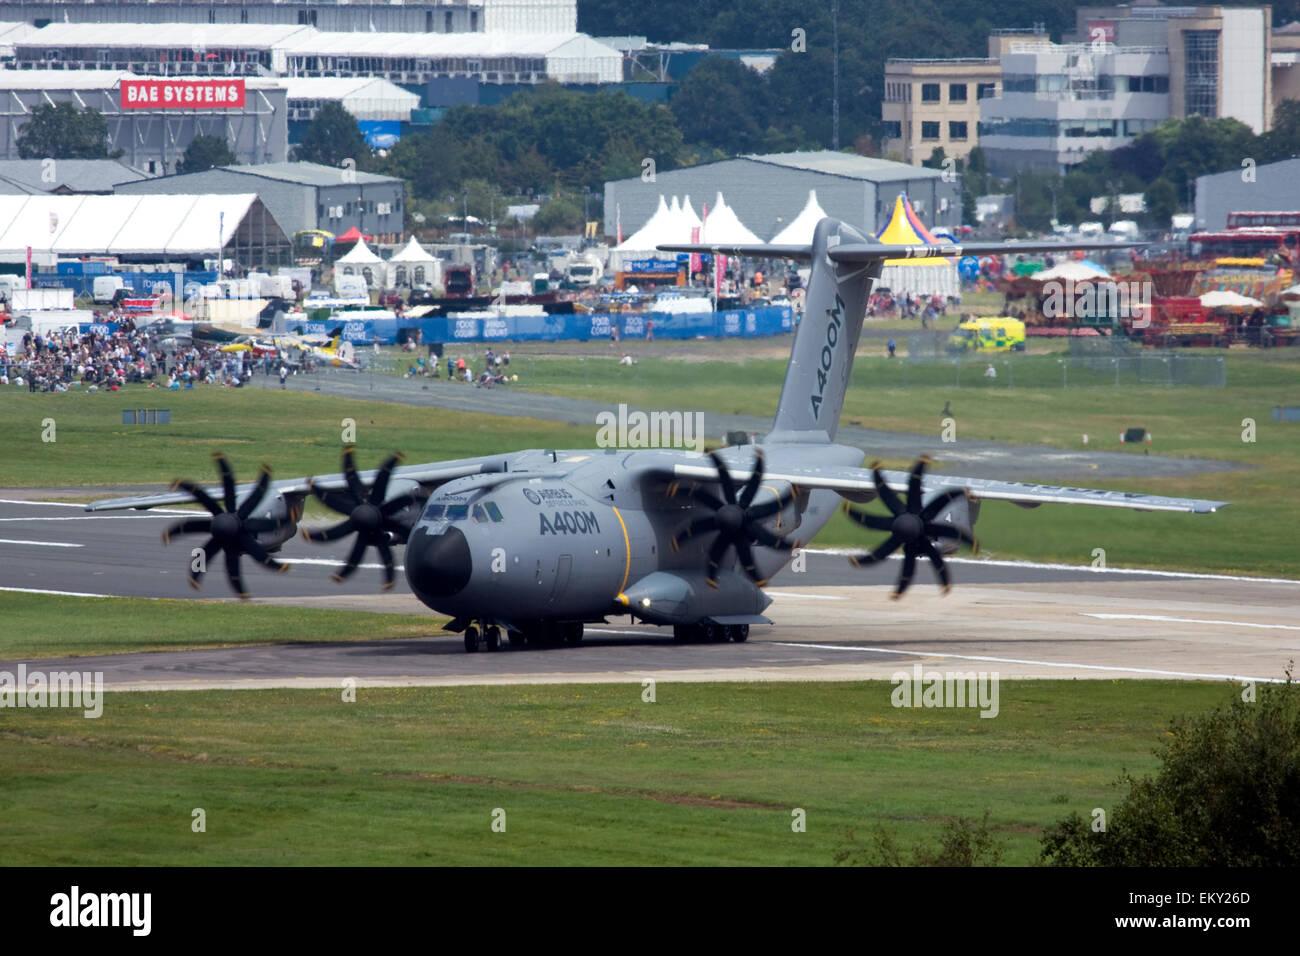 Airbus A400M Atlas military transport aircraft at Farnborough International Airshow 2014, UK Stock Photo